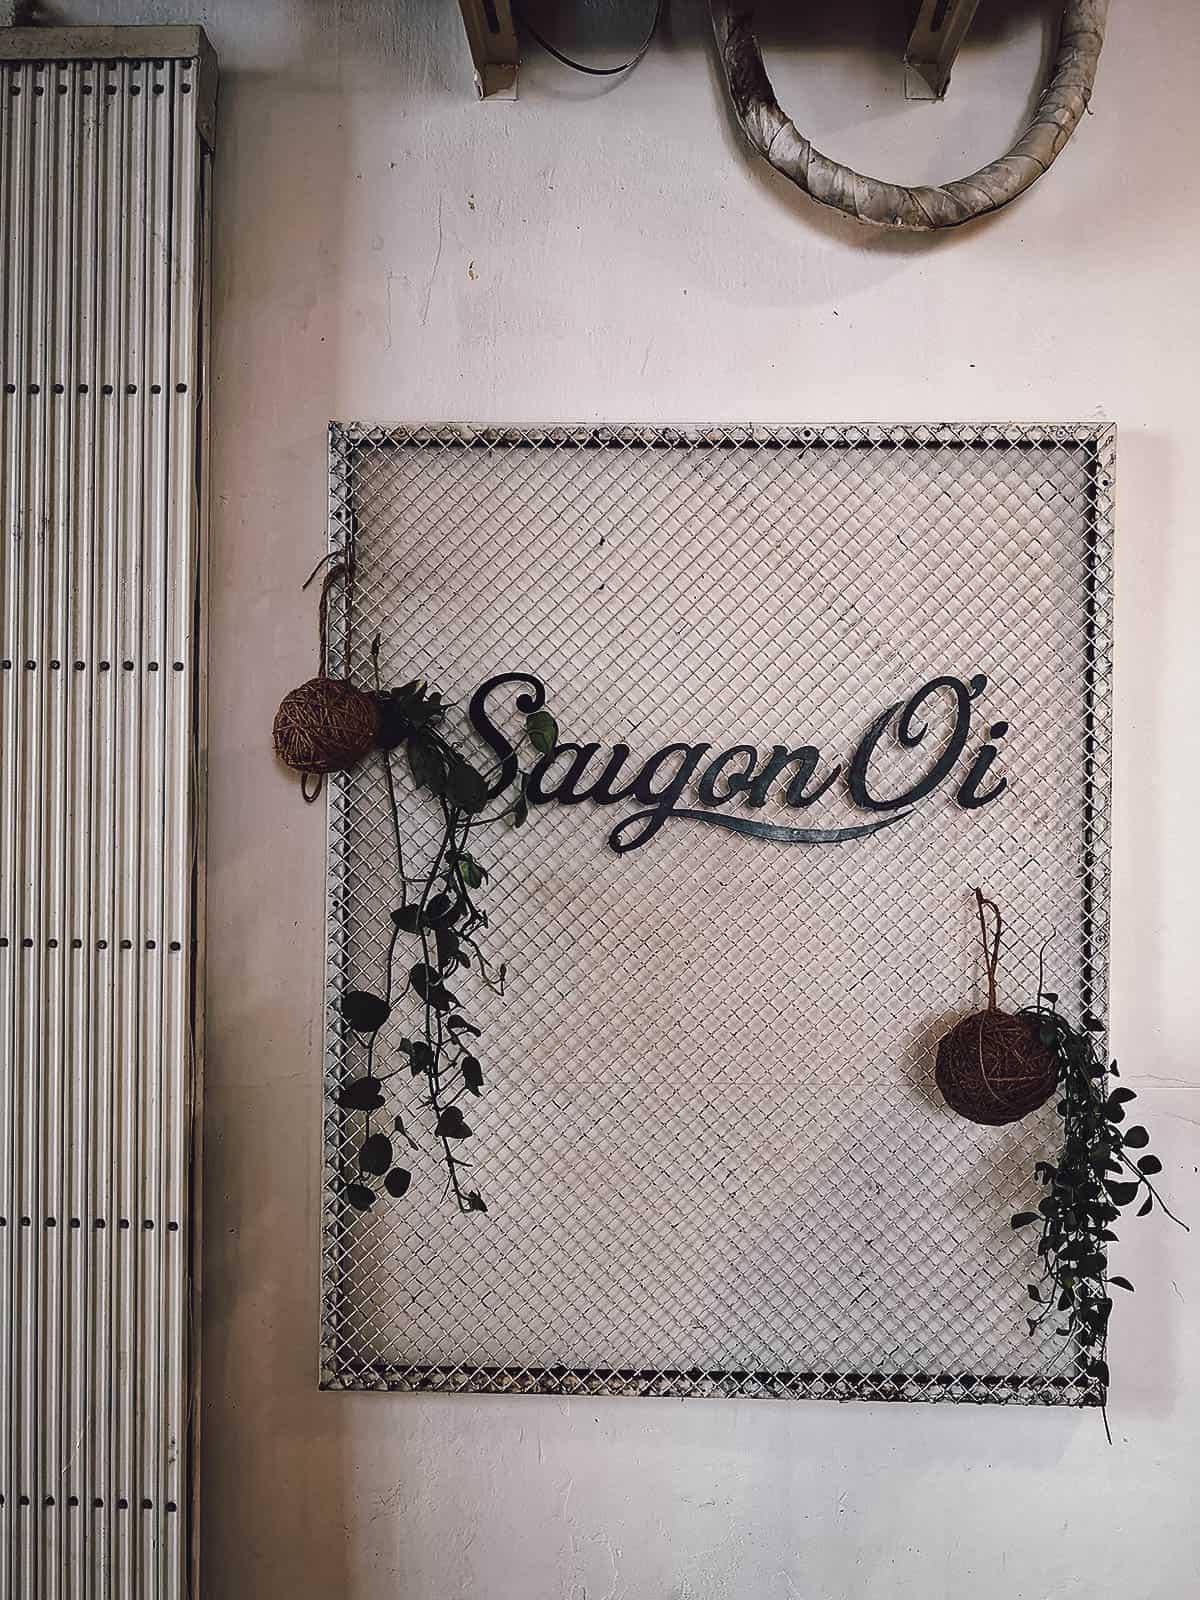 Saigon Oi signage